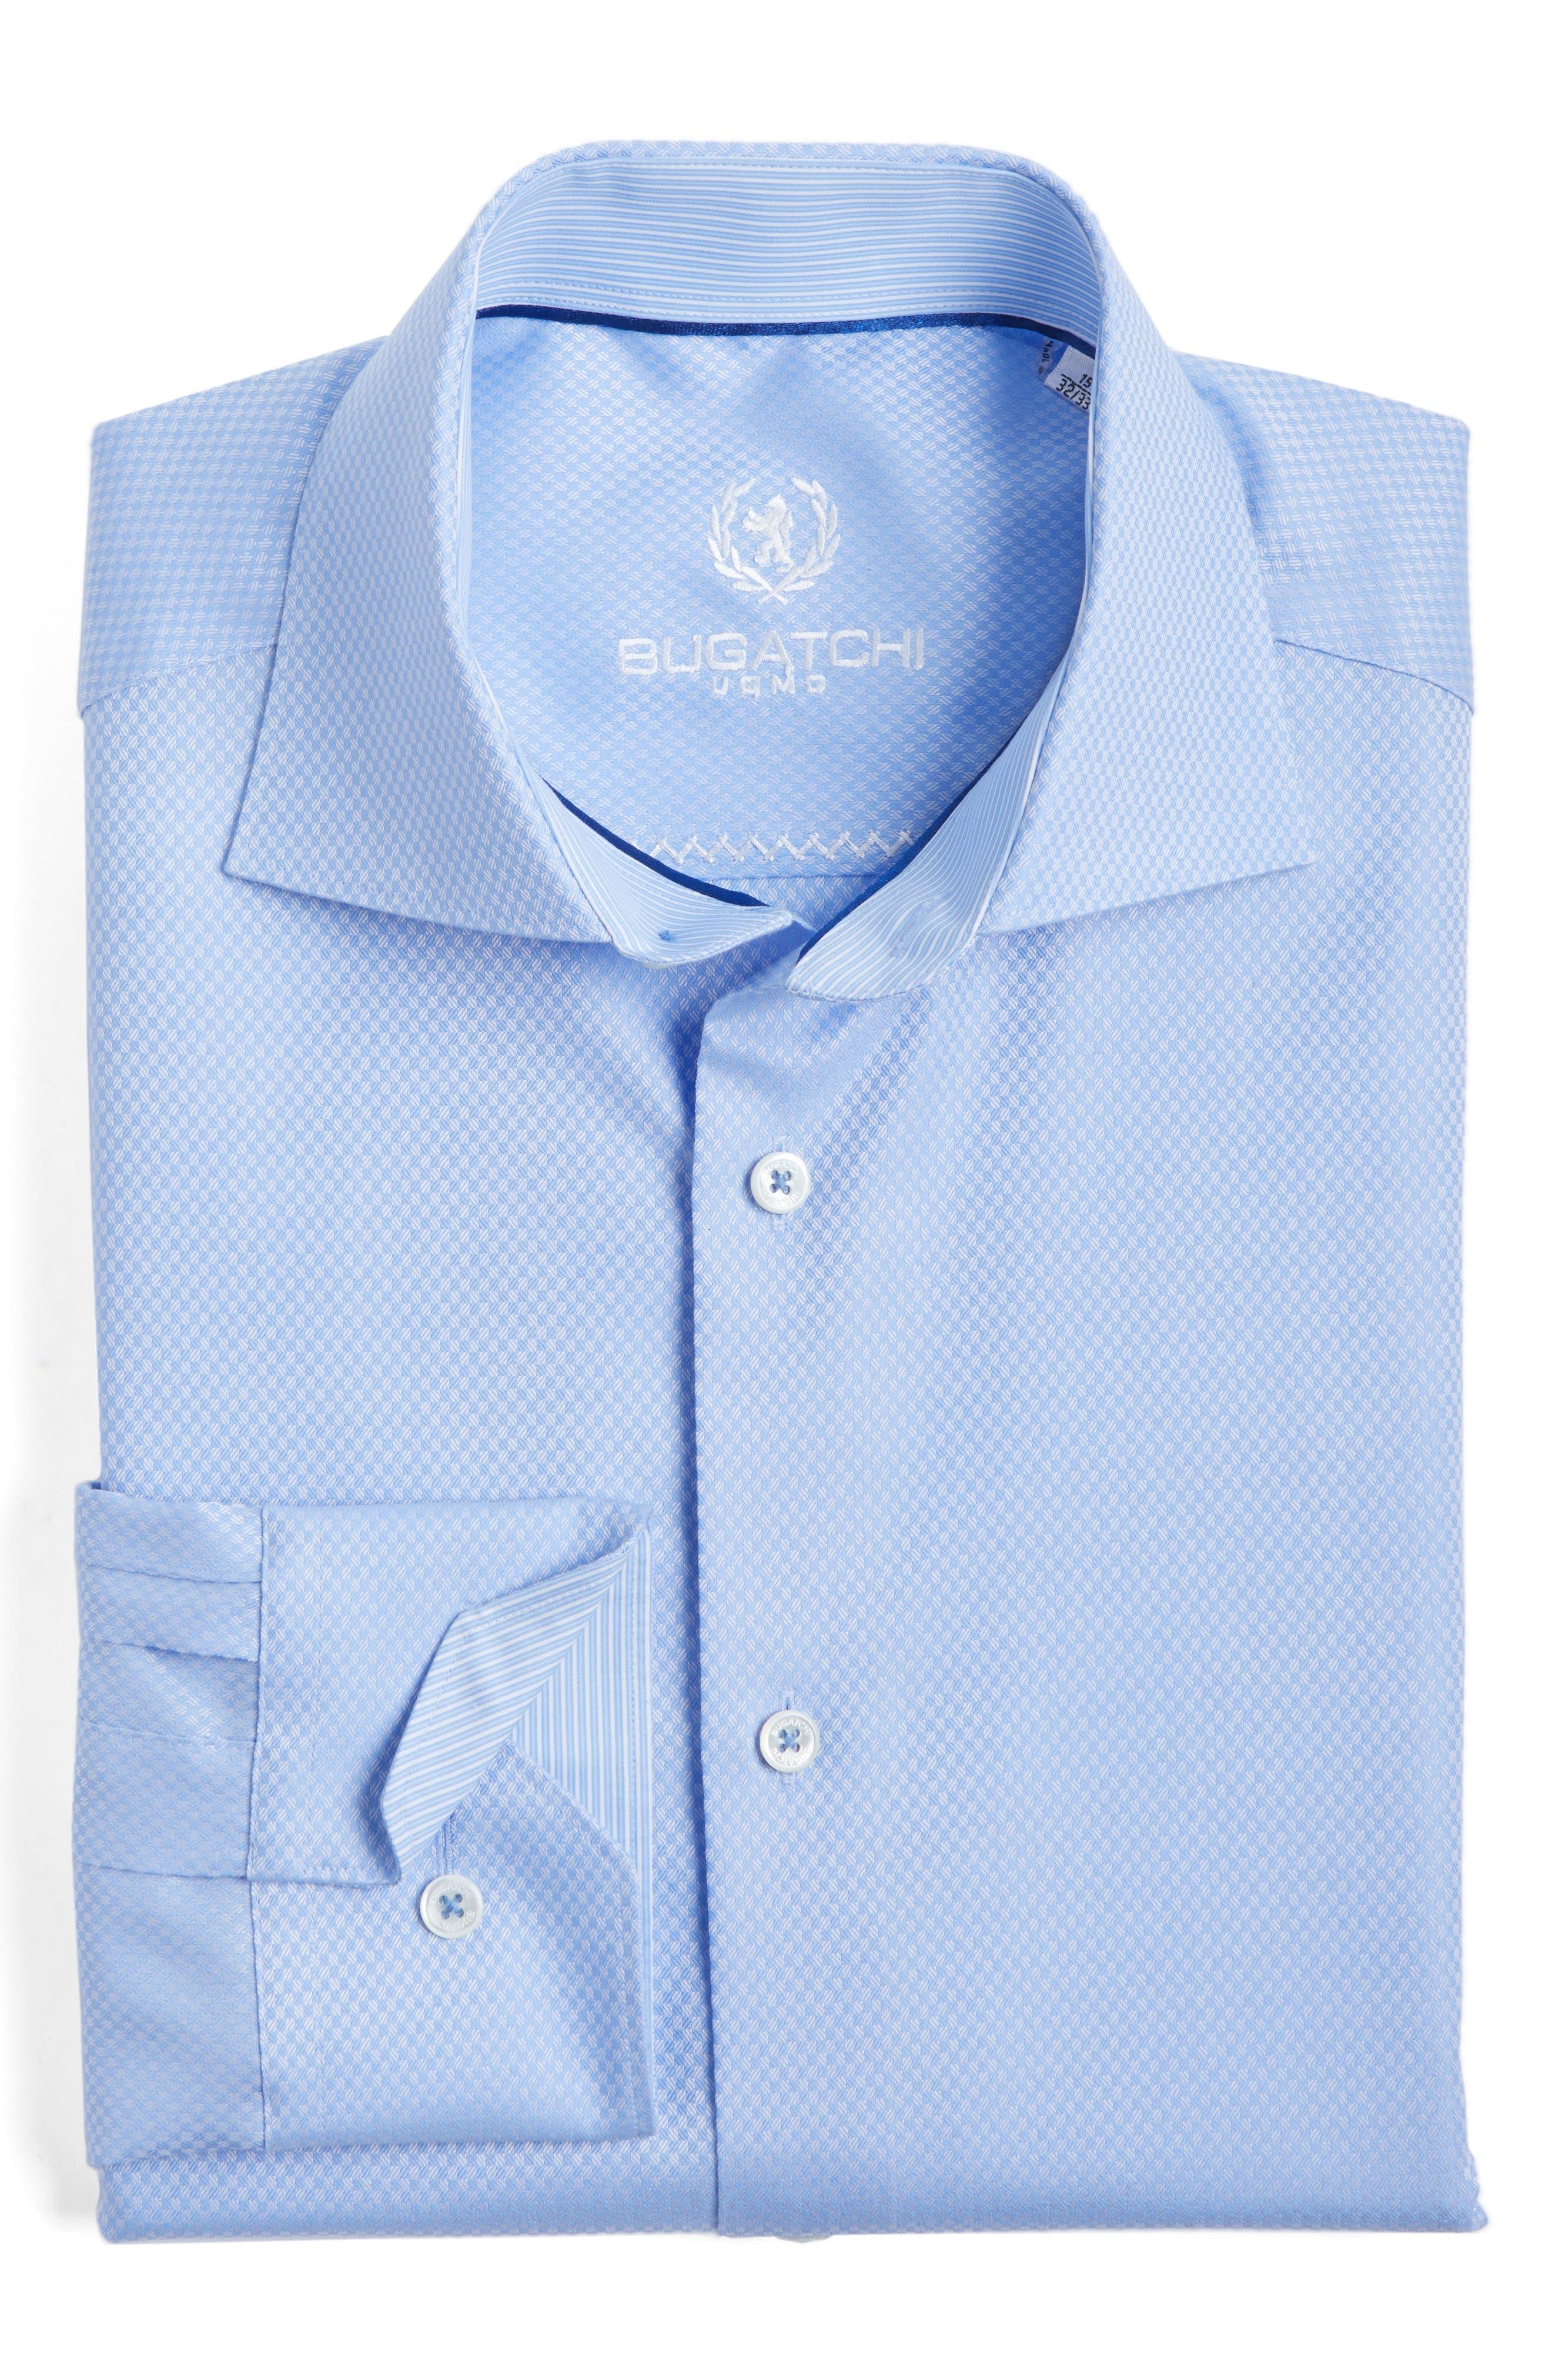 Bugatchi Trim Fit Twill Check Dress Shirt